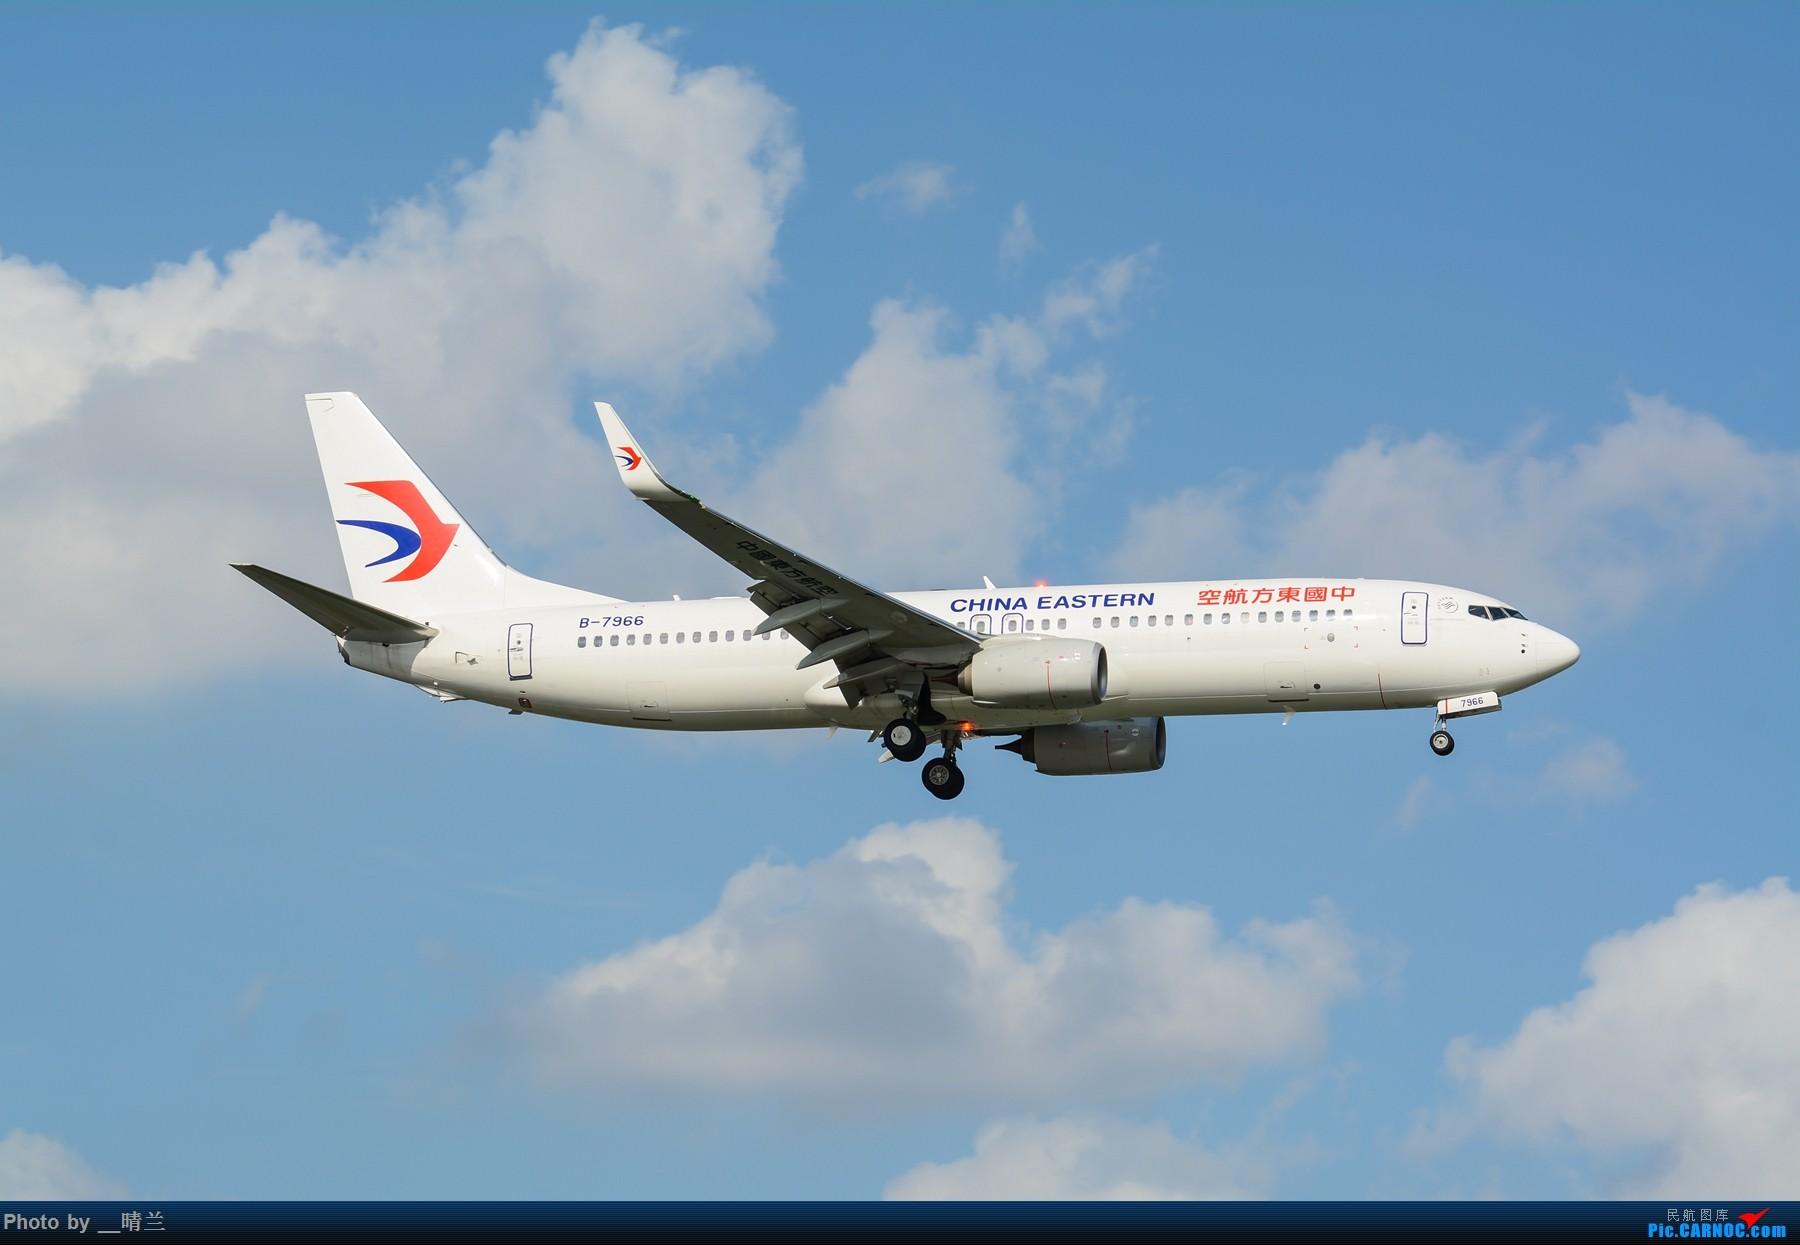 Re:[原创]果然昨天发了图,今天SHA就是大蓝天~~最开心的事莫过于基友们一起拍机! BOEING 737-800 B-7966 中国上海虹桥国际机场